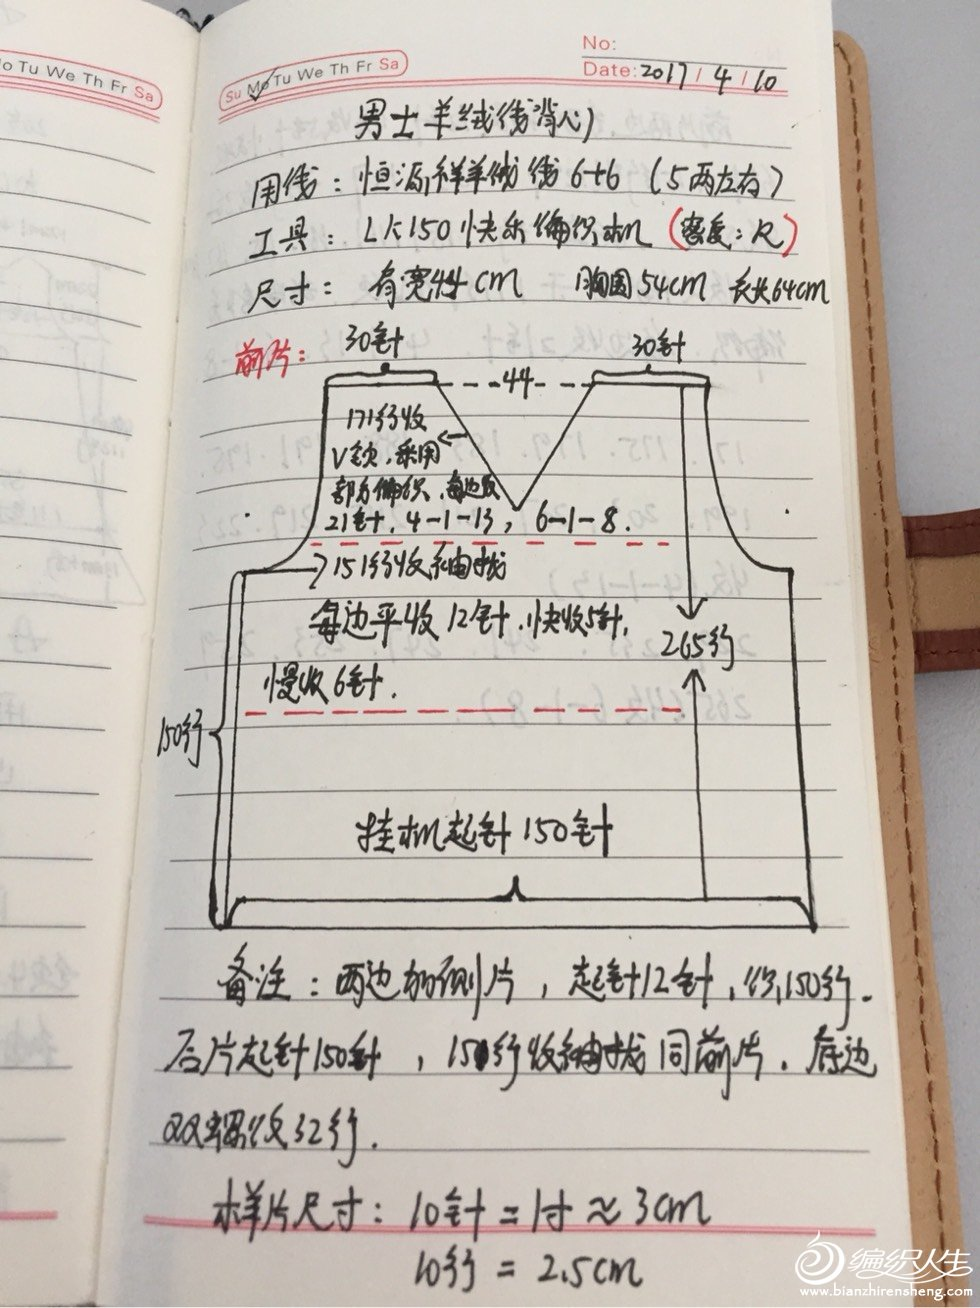 LK150机织男士U乐娱乐youle88